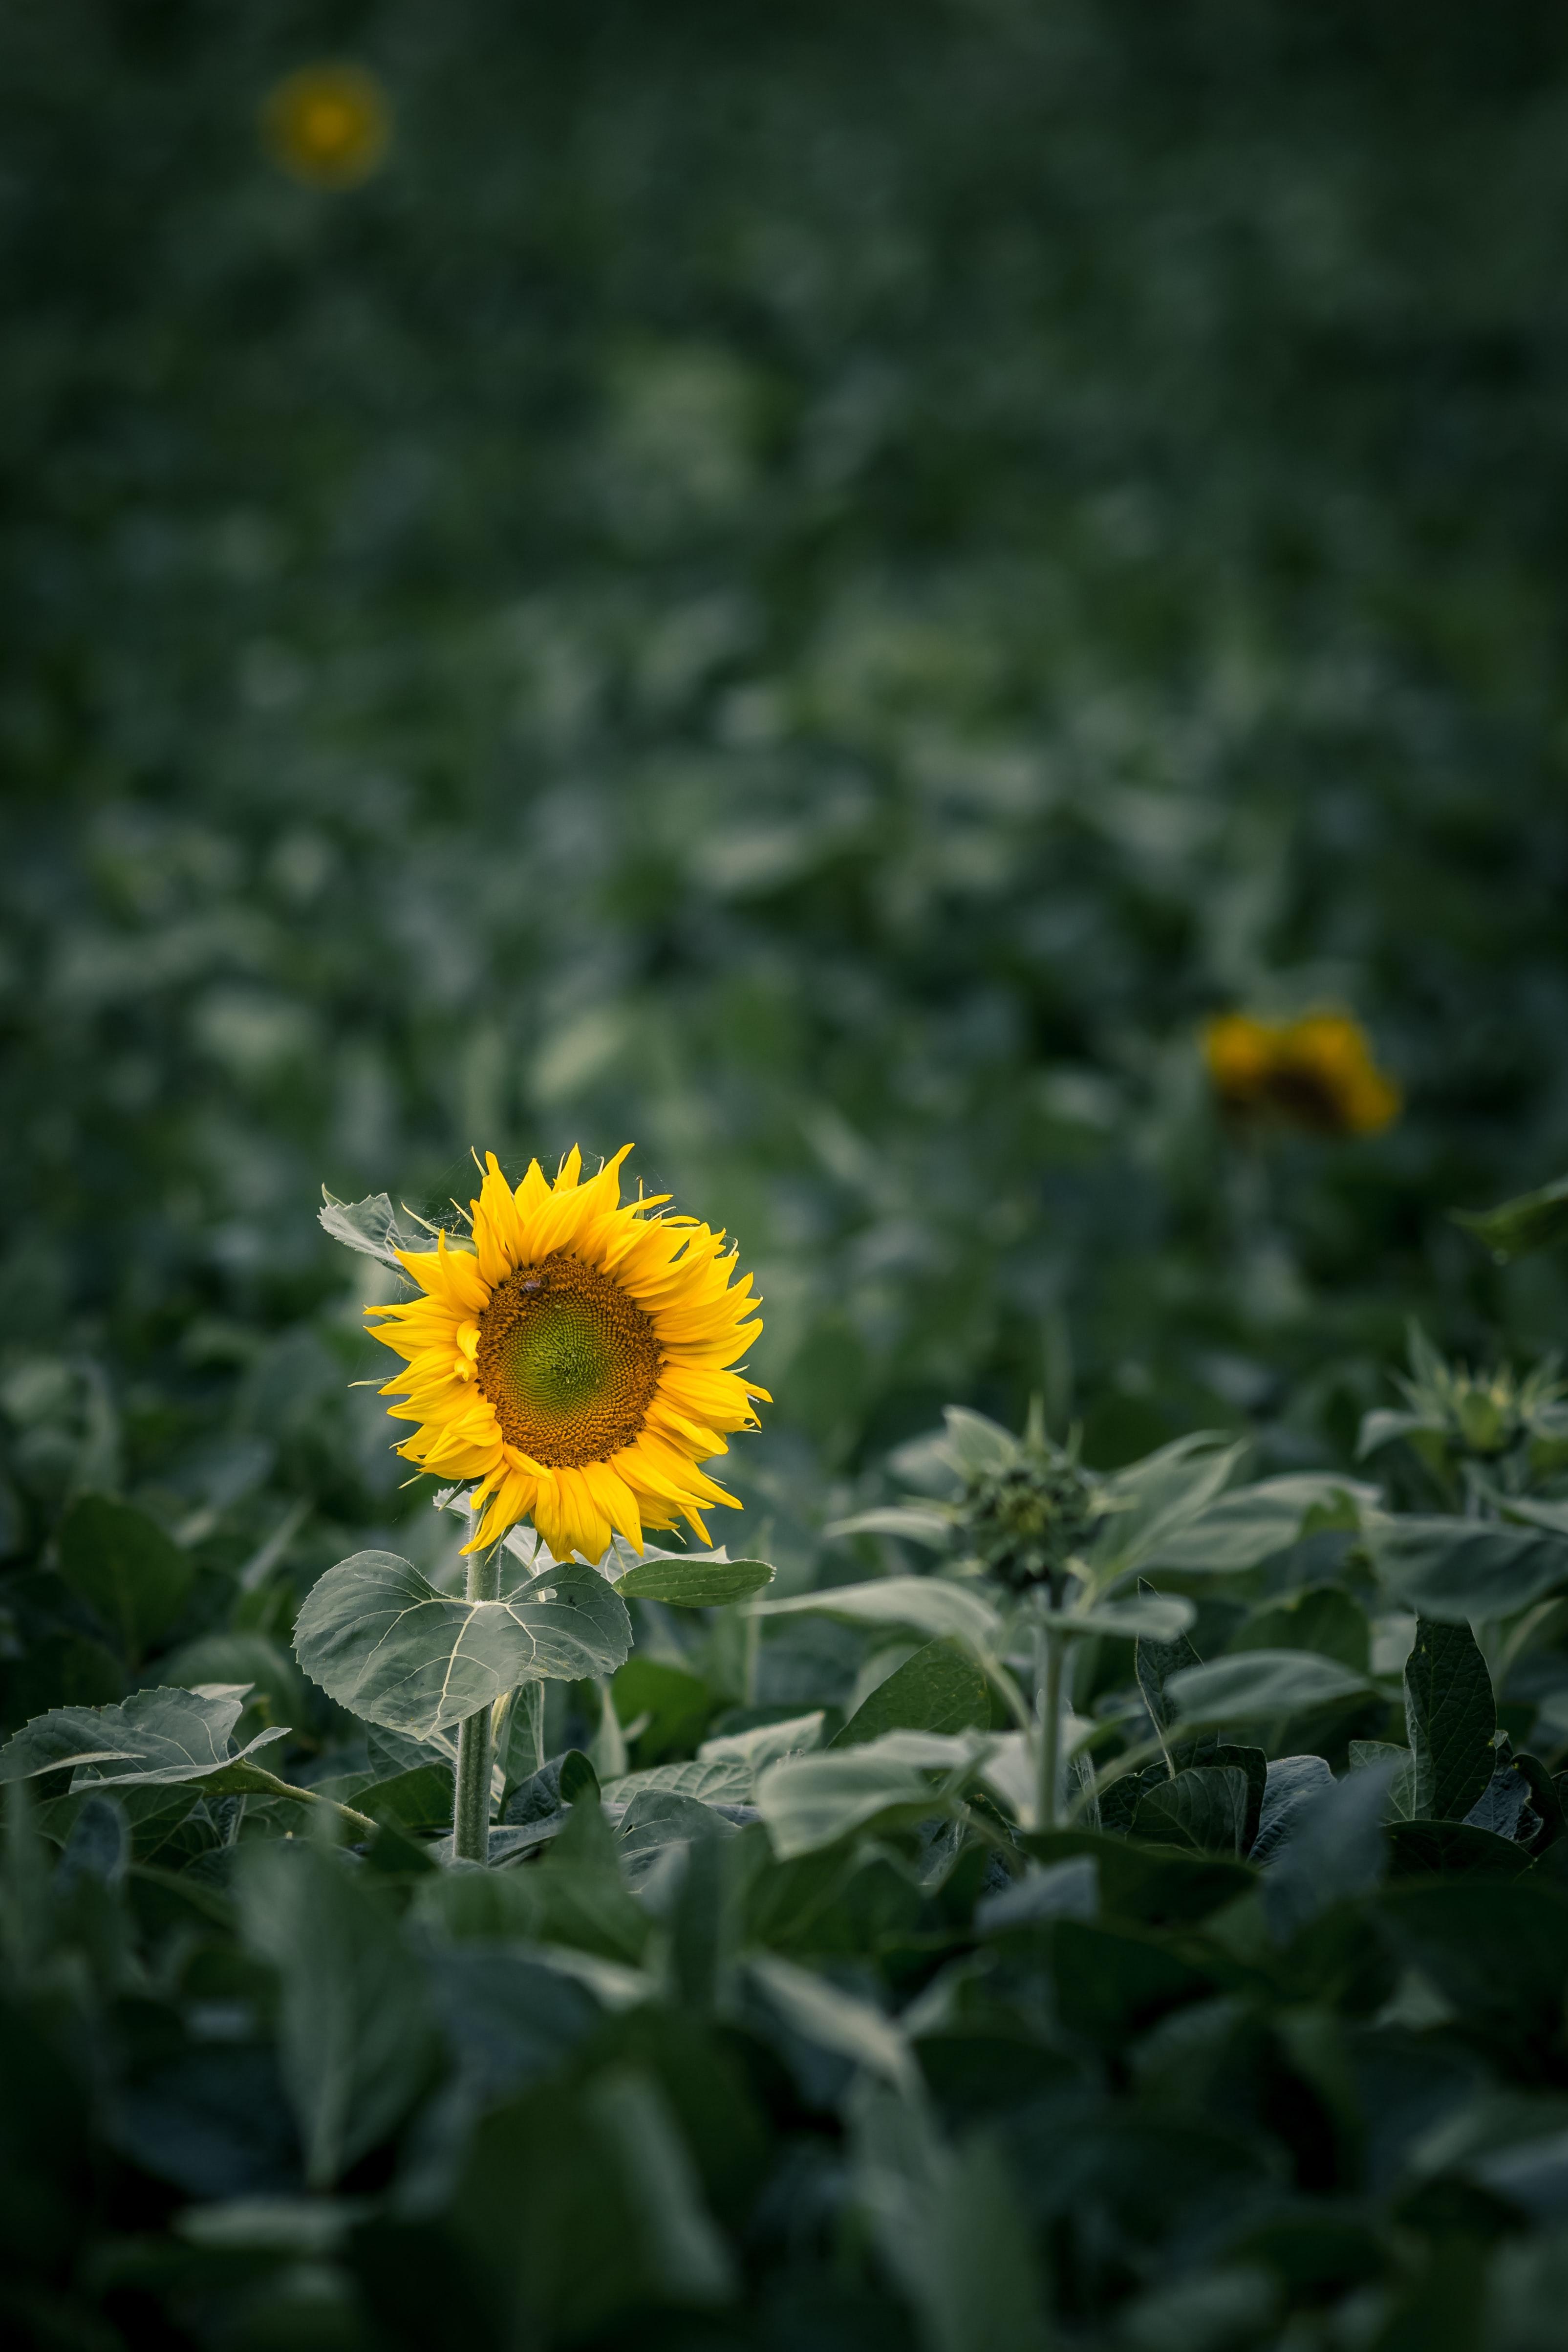 900 Sunflower Background Images Download Hd Backgrounds On Unsplash